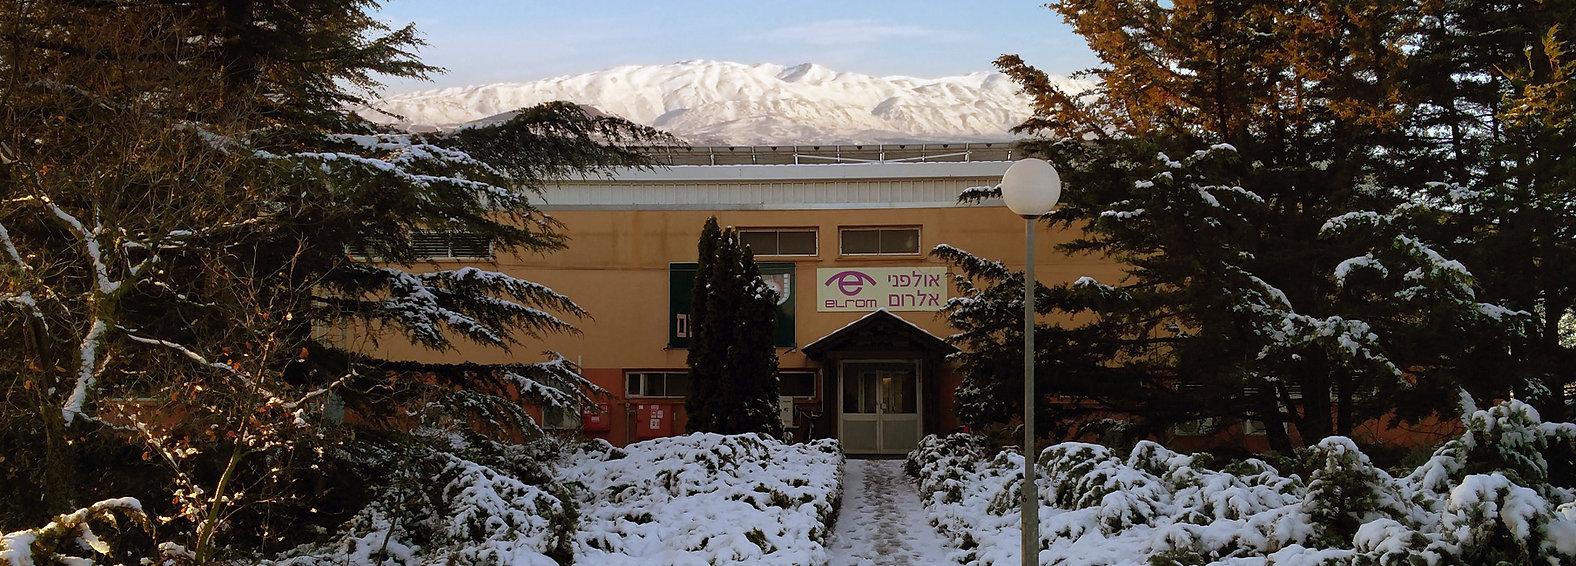 Elrom Studios localization services